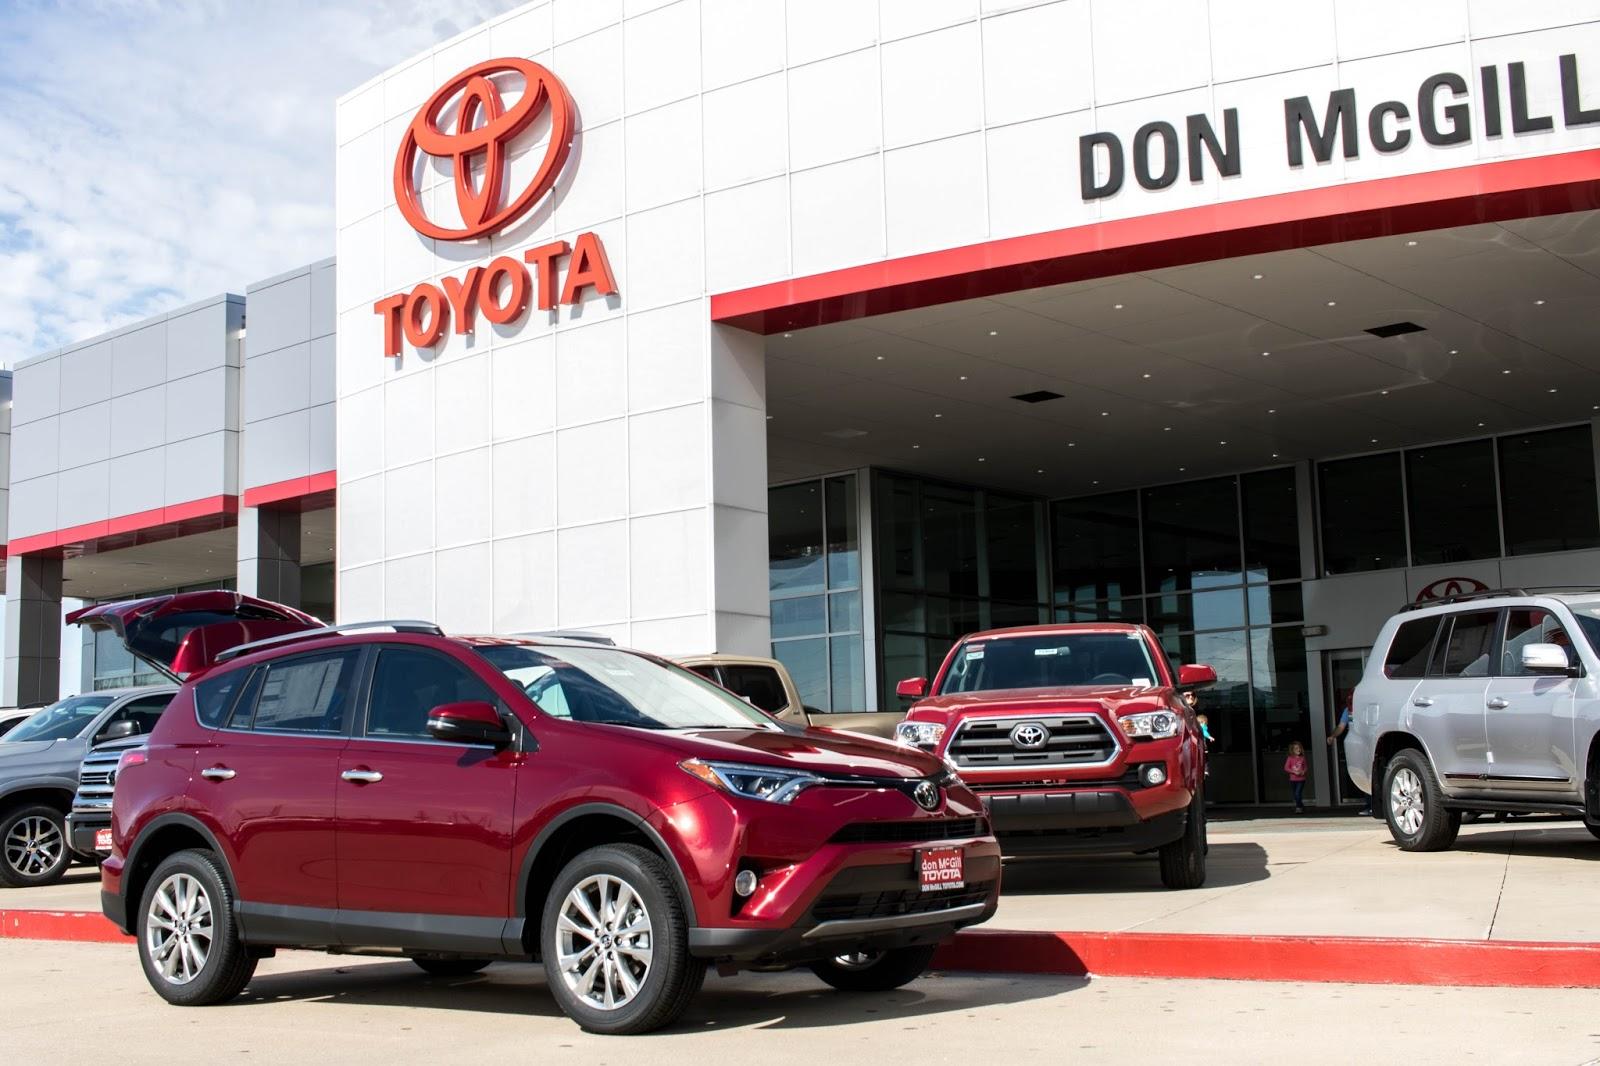 Don McGill Toyota Houston · 2018 Toyota RAV4 Limited